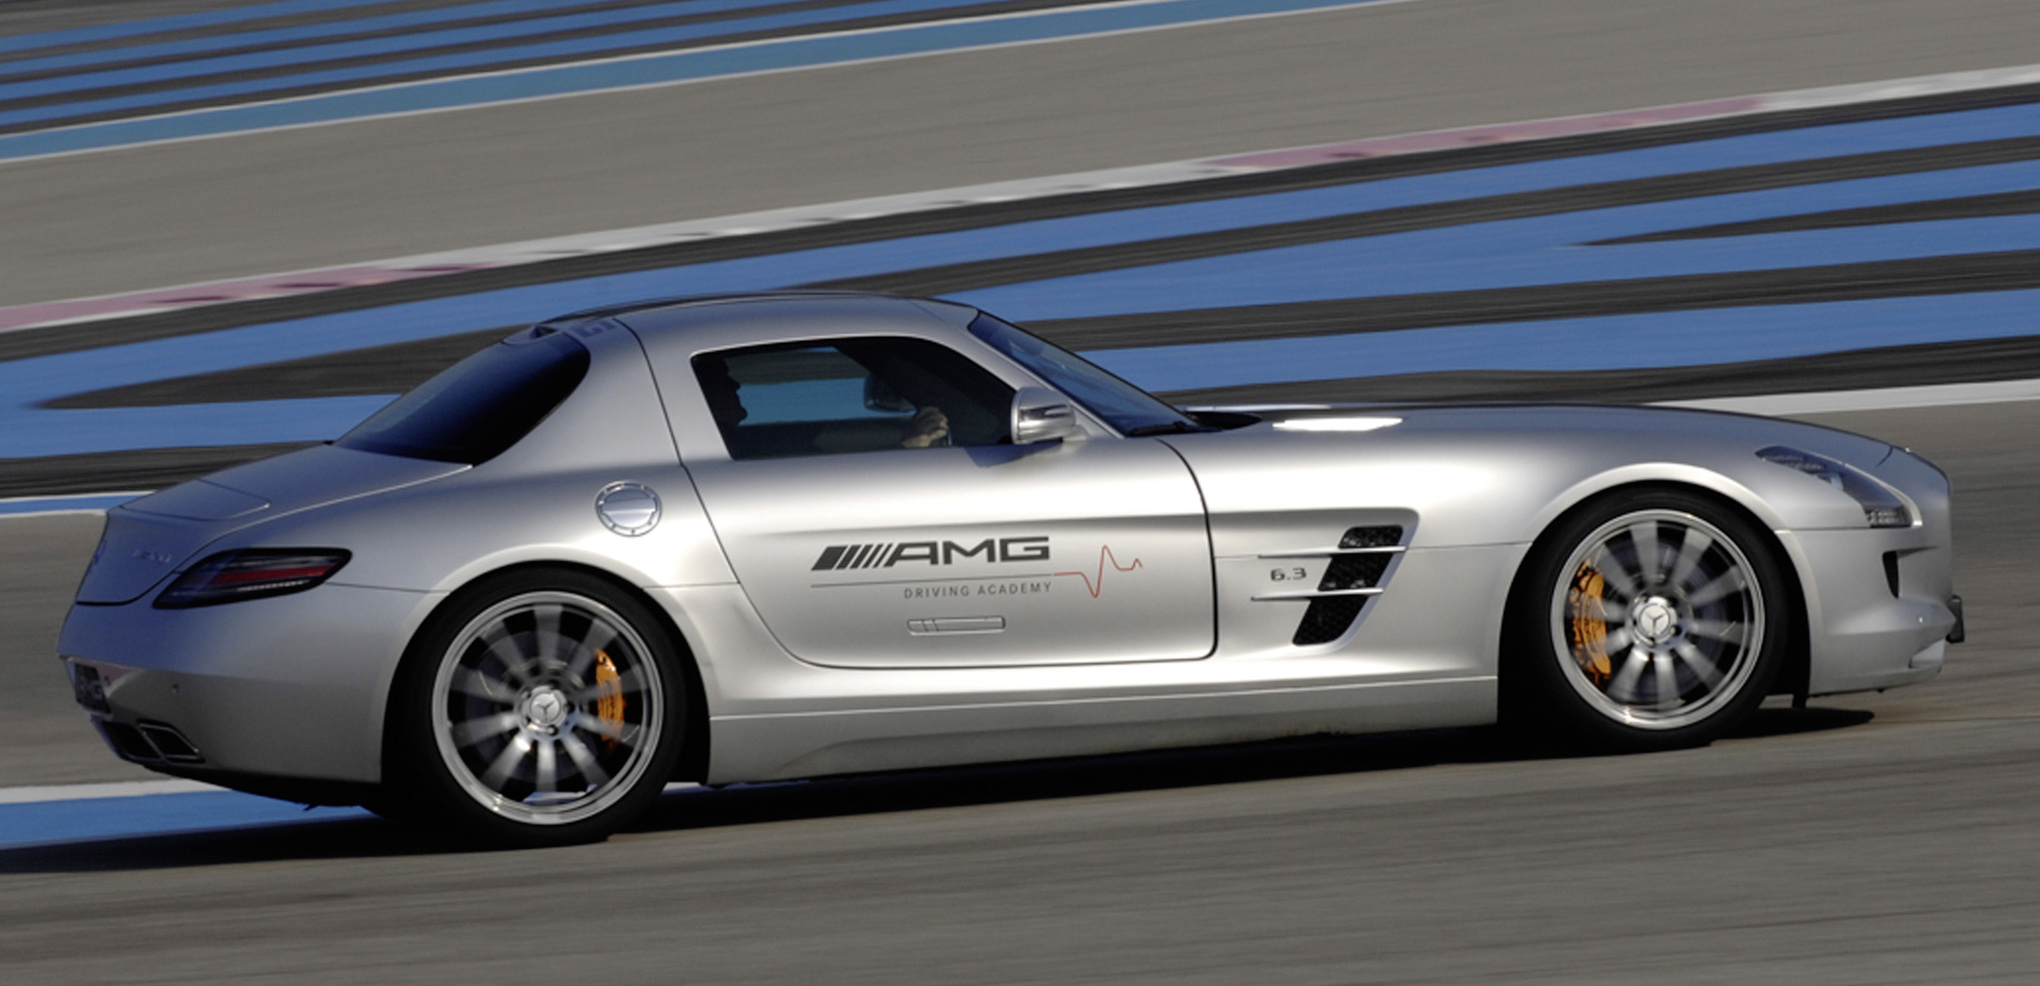 AMG Driving Academy – Vallelunga